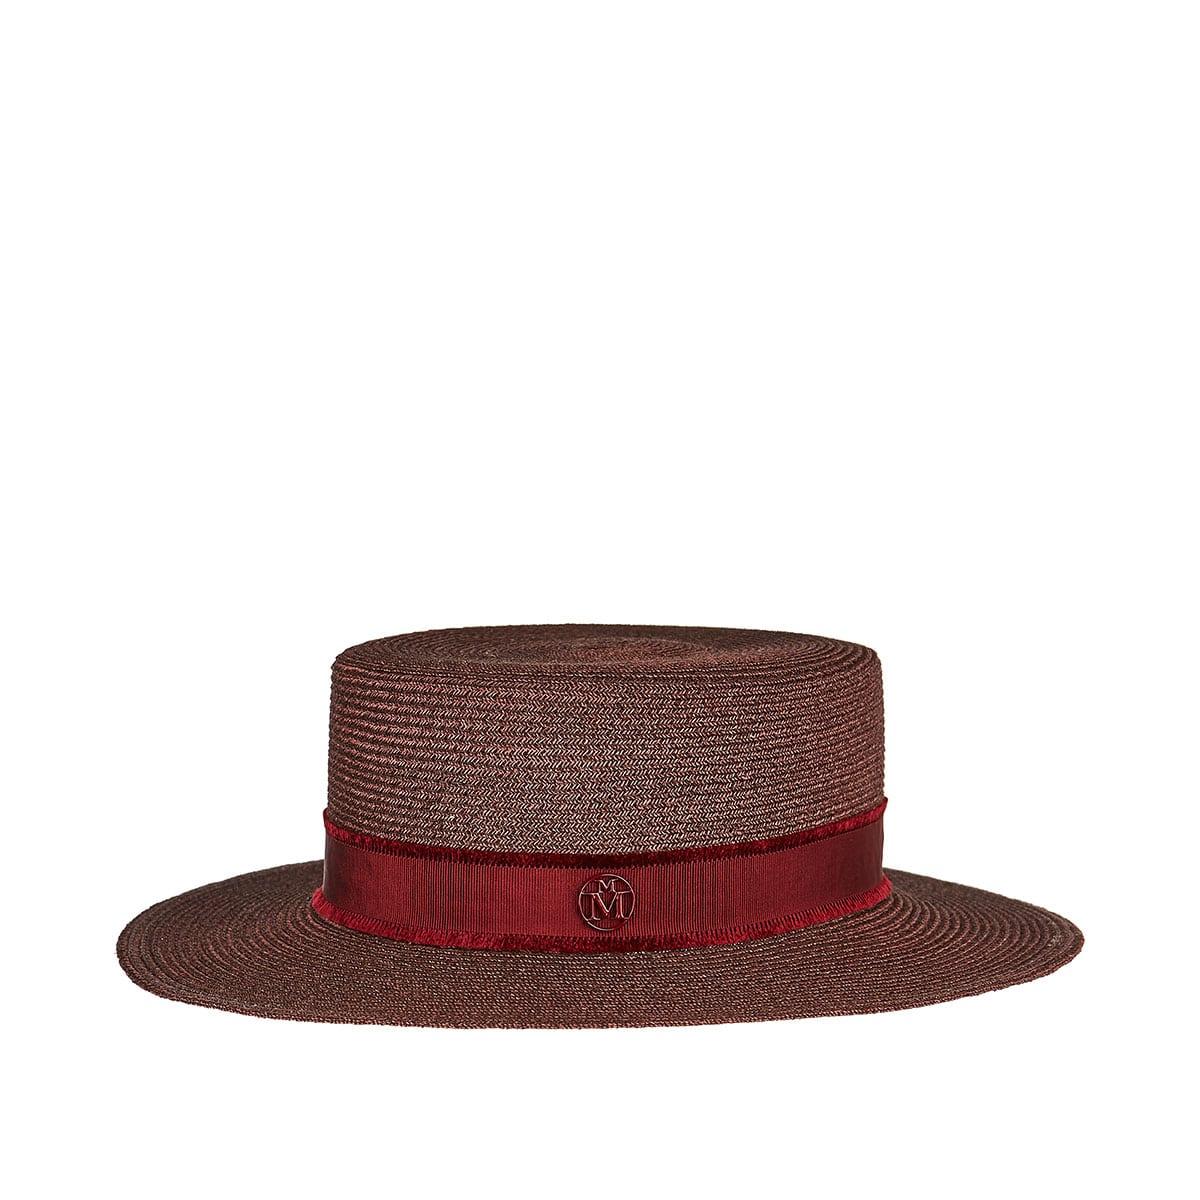 Kiki woven canotier hat